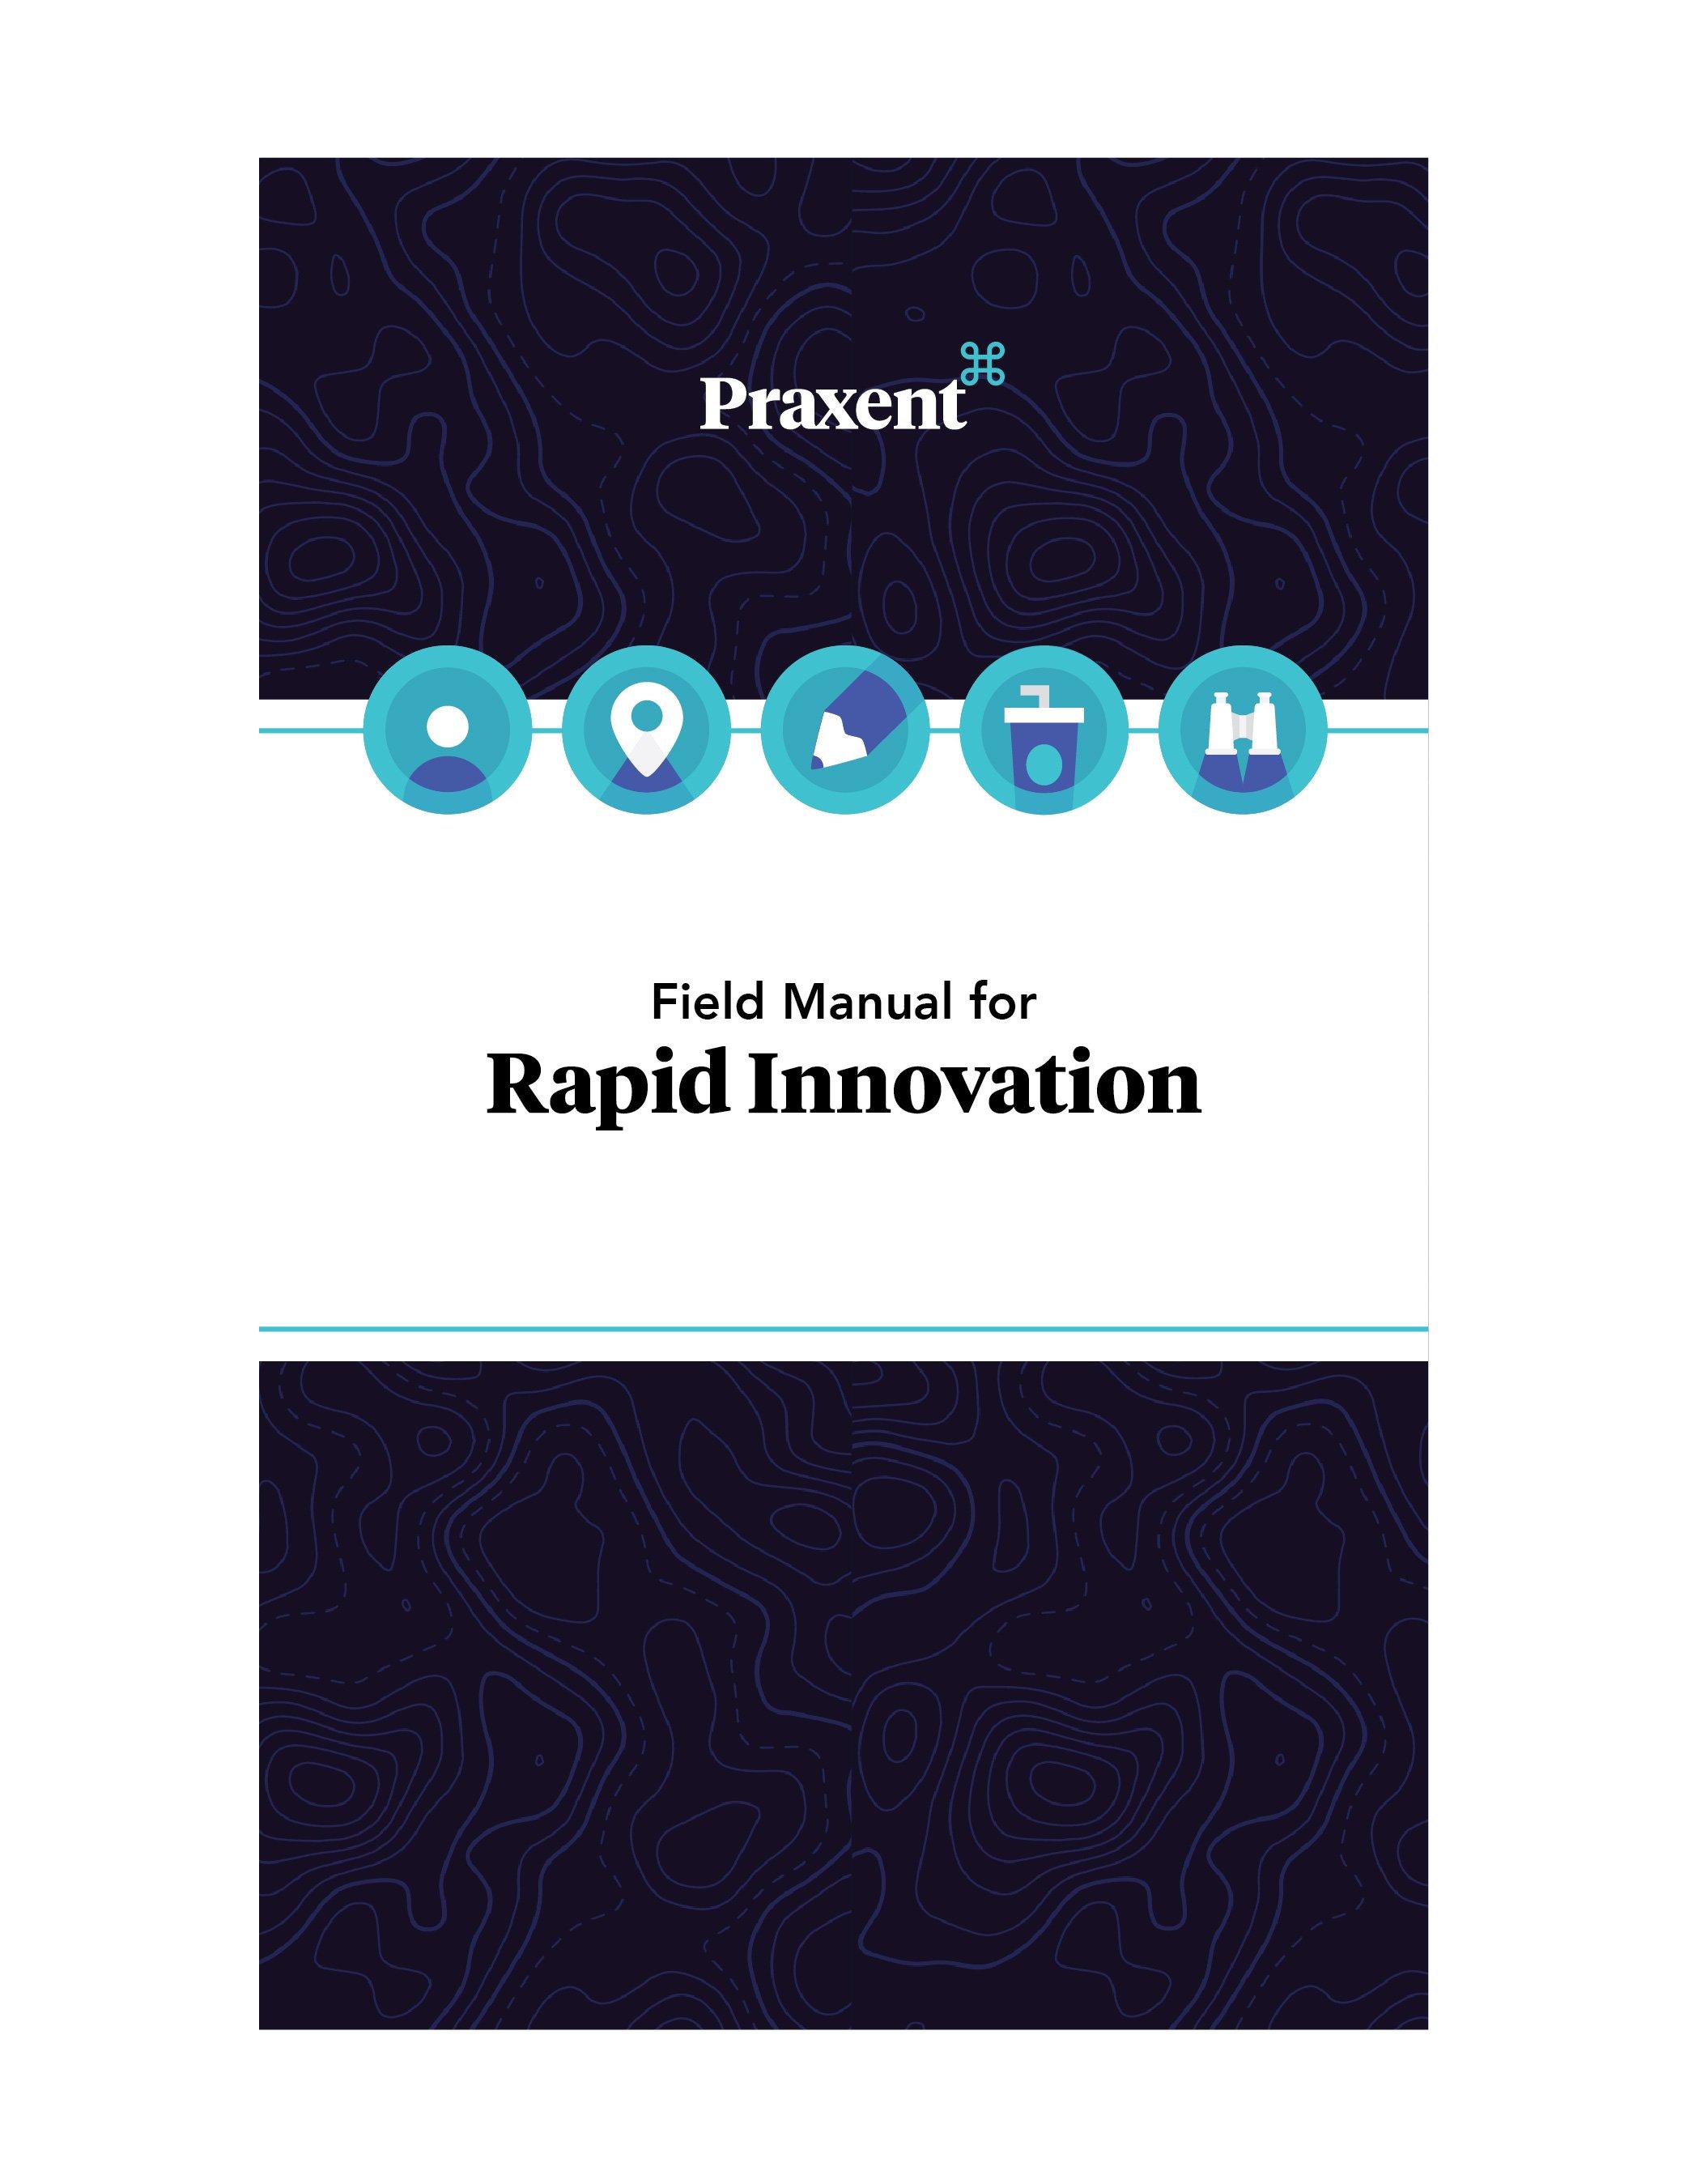 Marketing_Covers_UserJourney_MentalMap_Field_Manual_RapidInnovation_WebCover